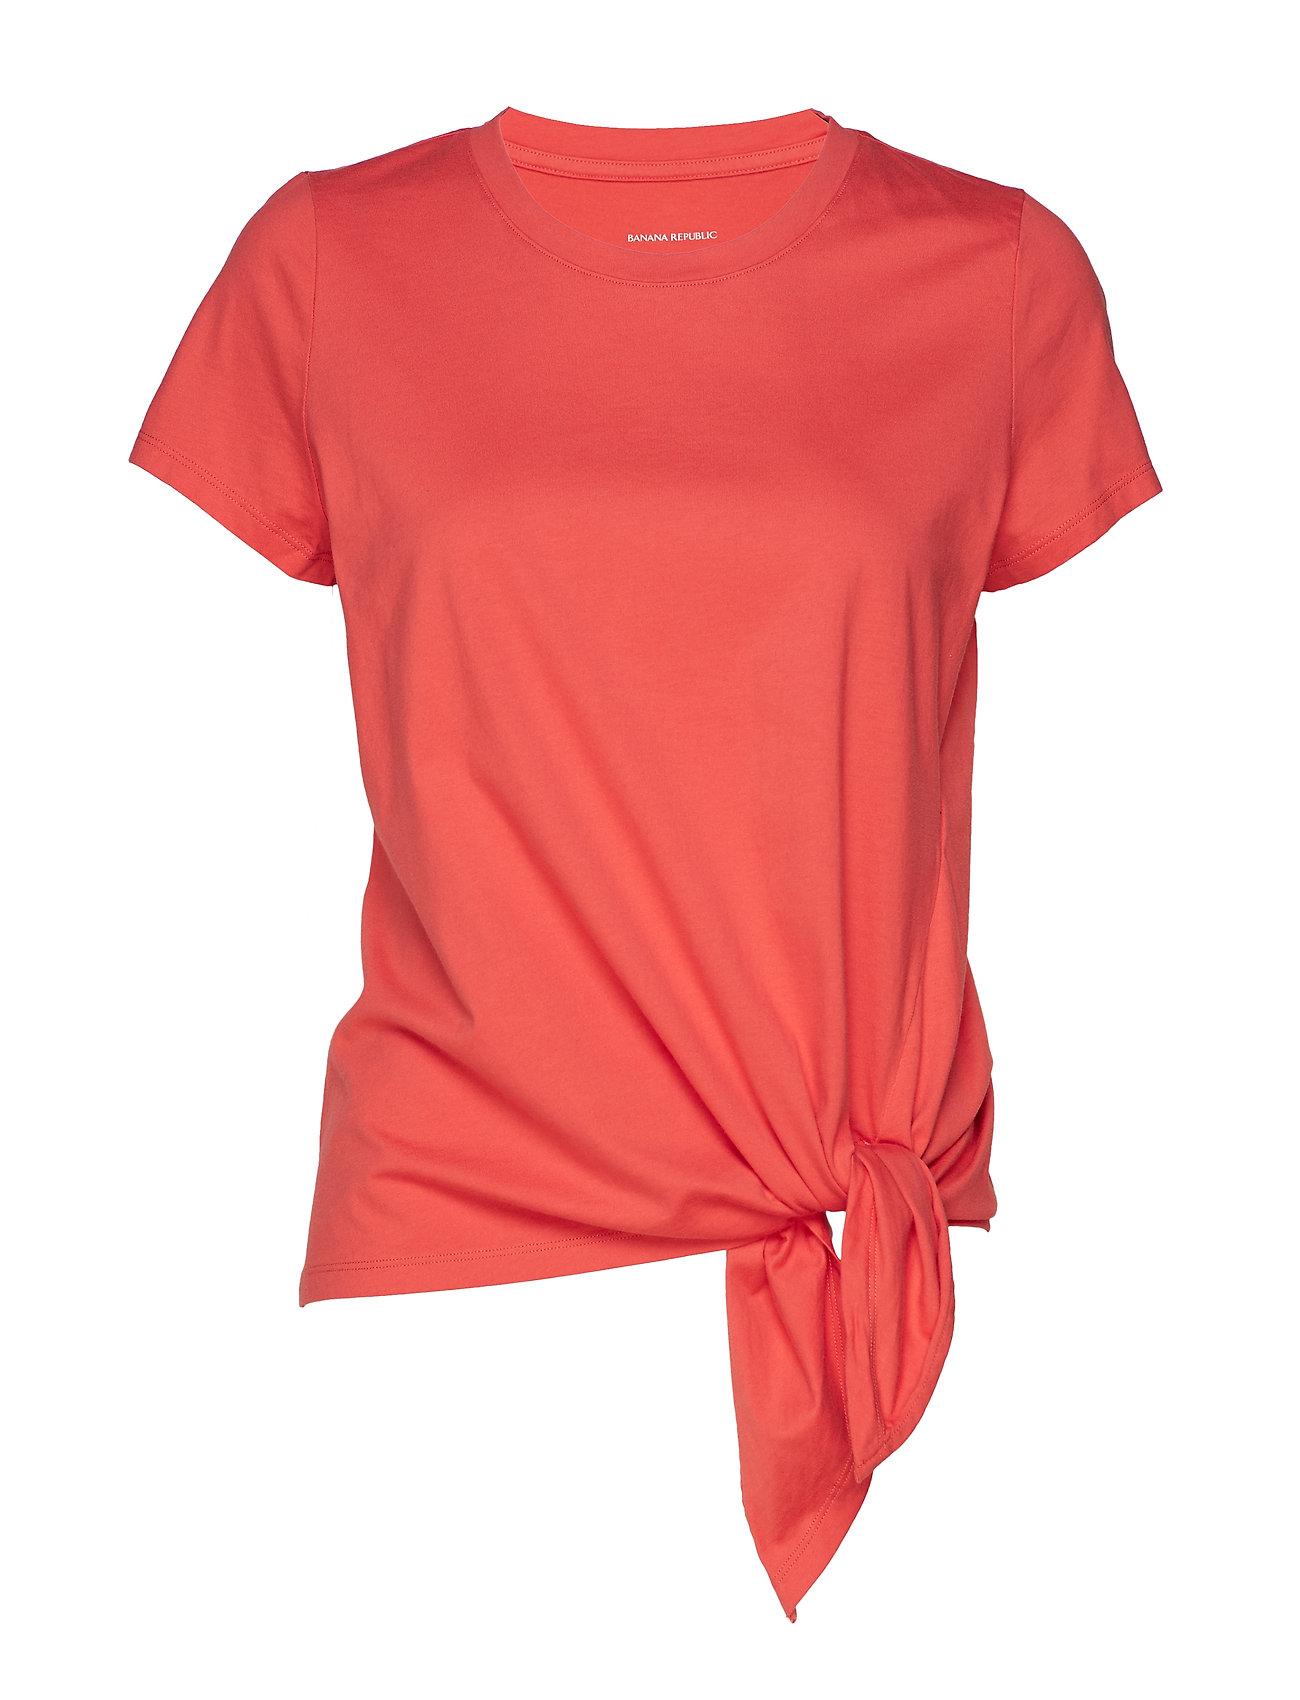 Banana Republic SUPIMA® Cotton Tie-Hem T-Shirt - HOT RED